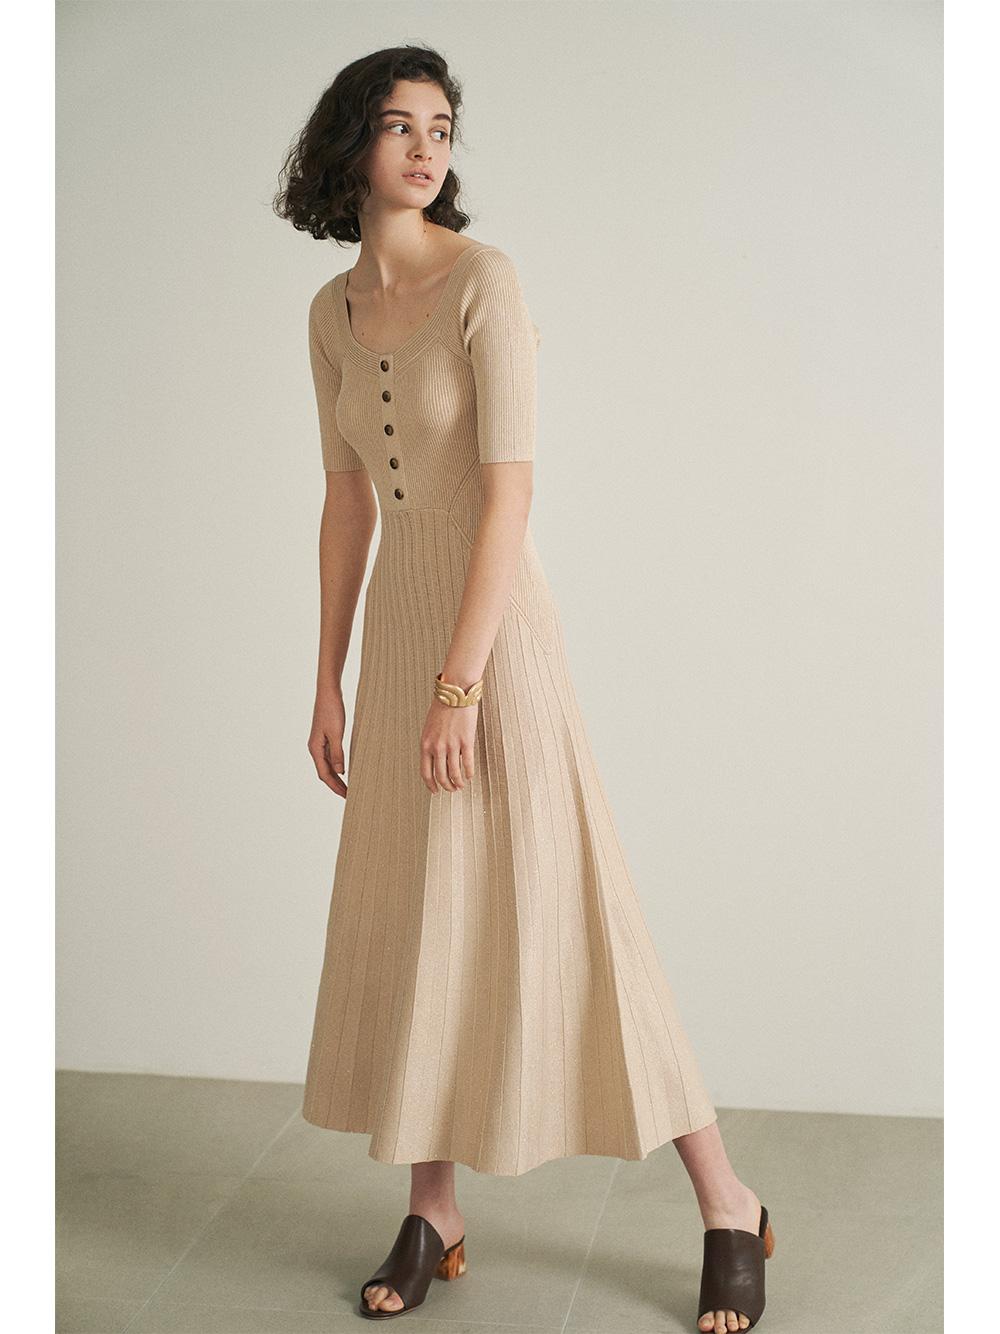 2way針織連身裙